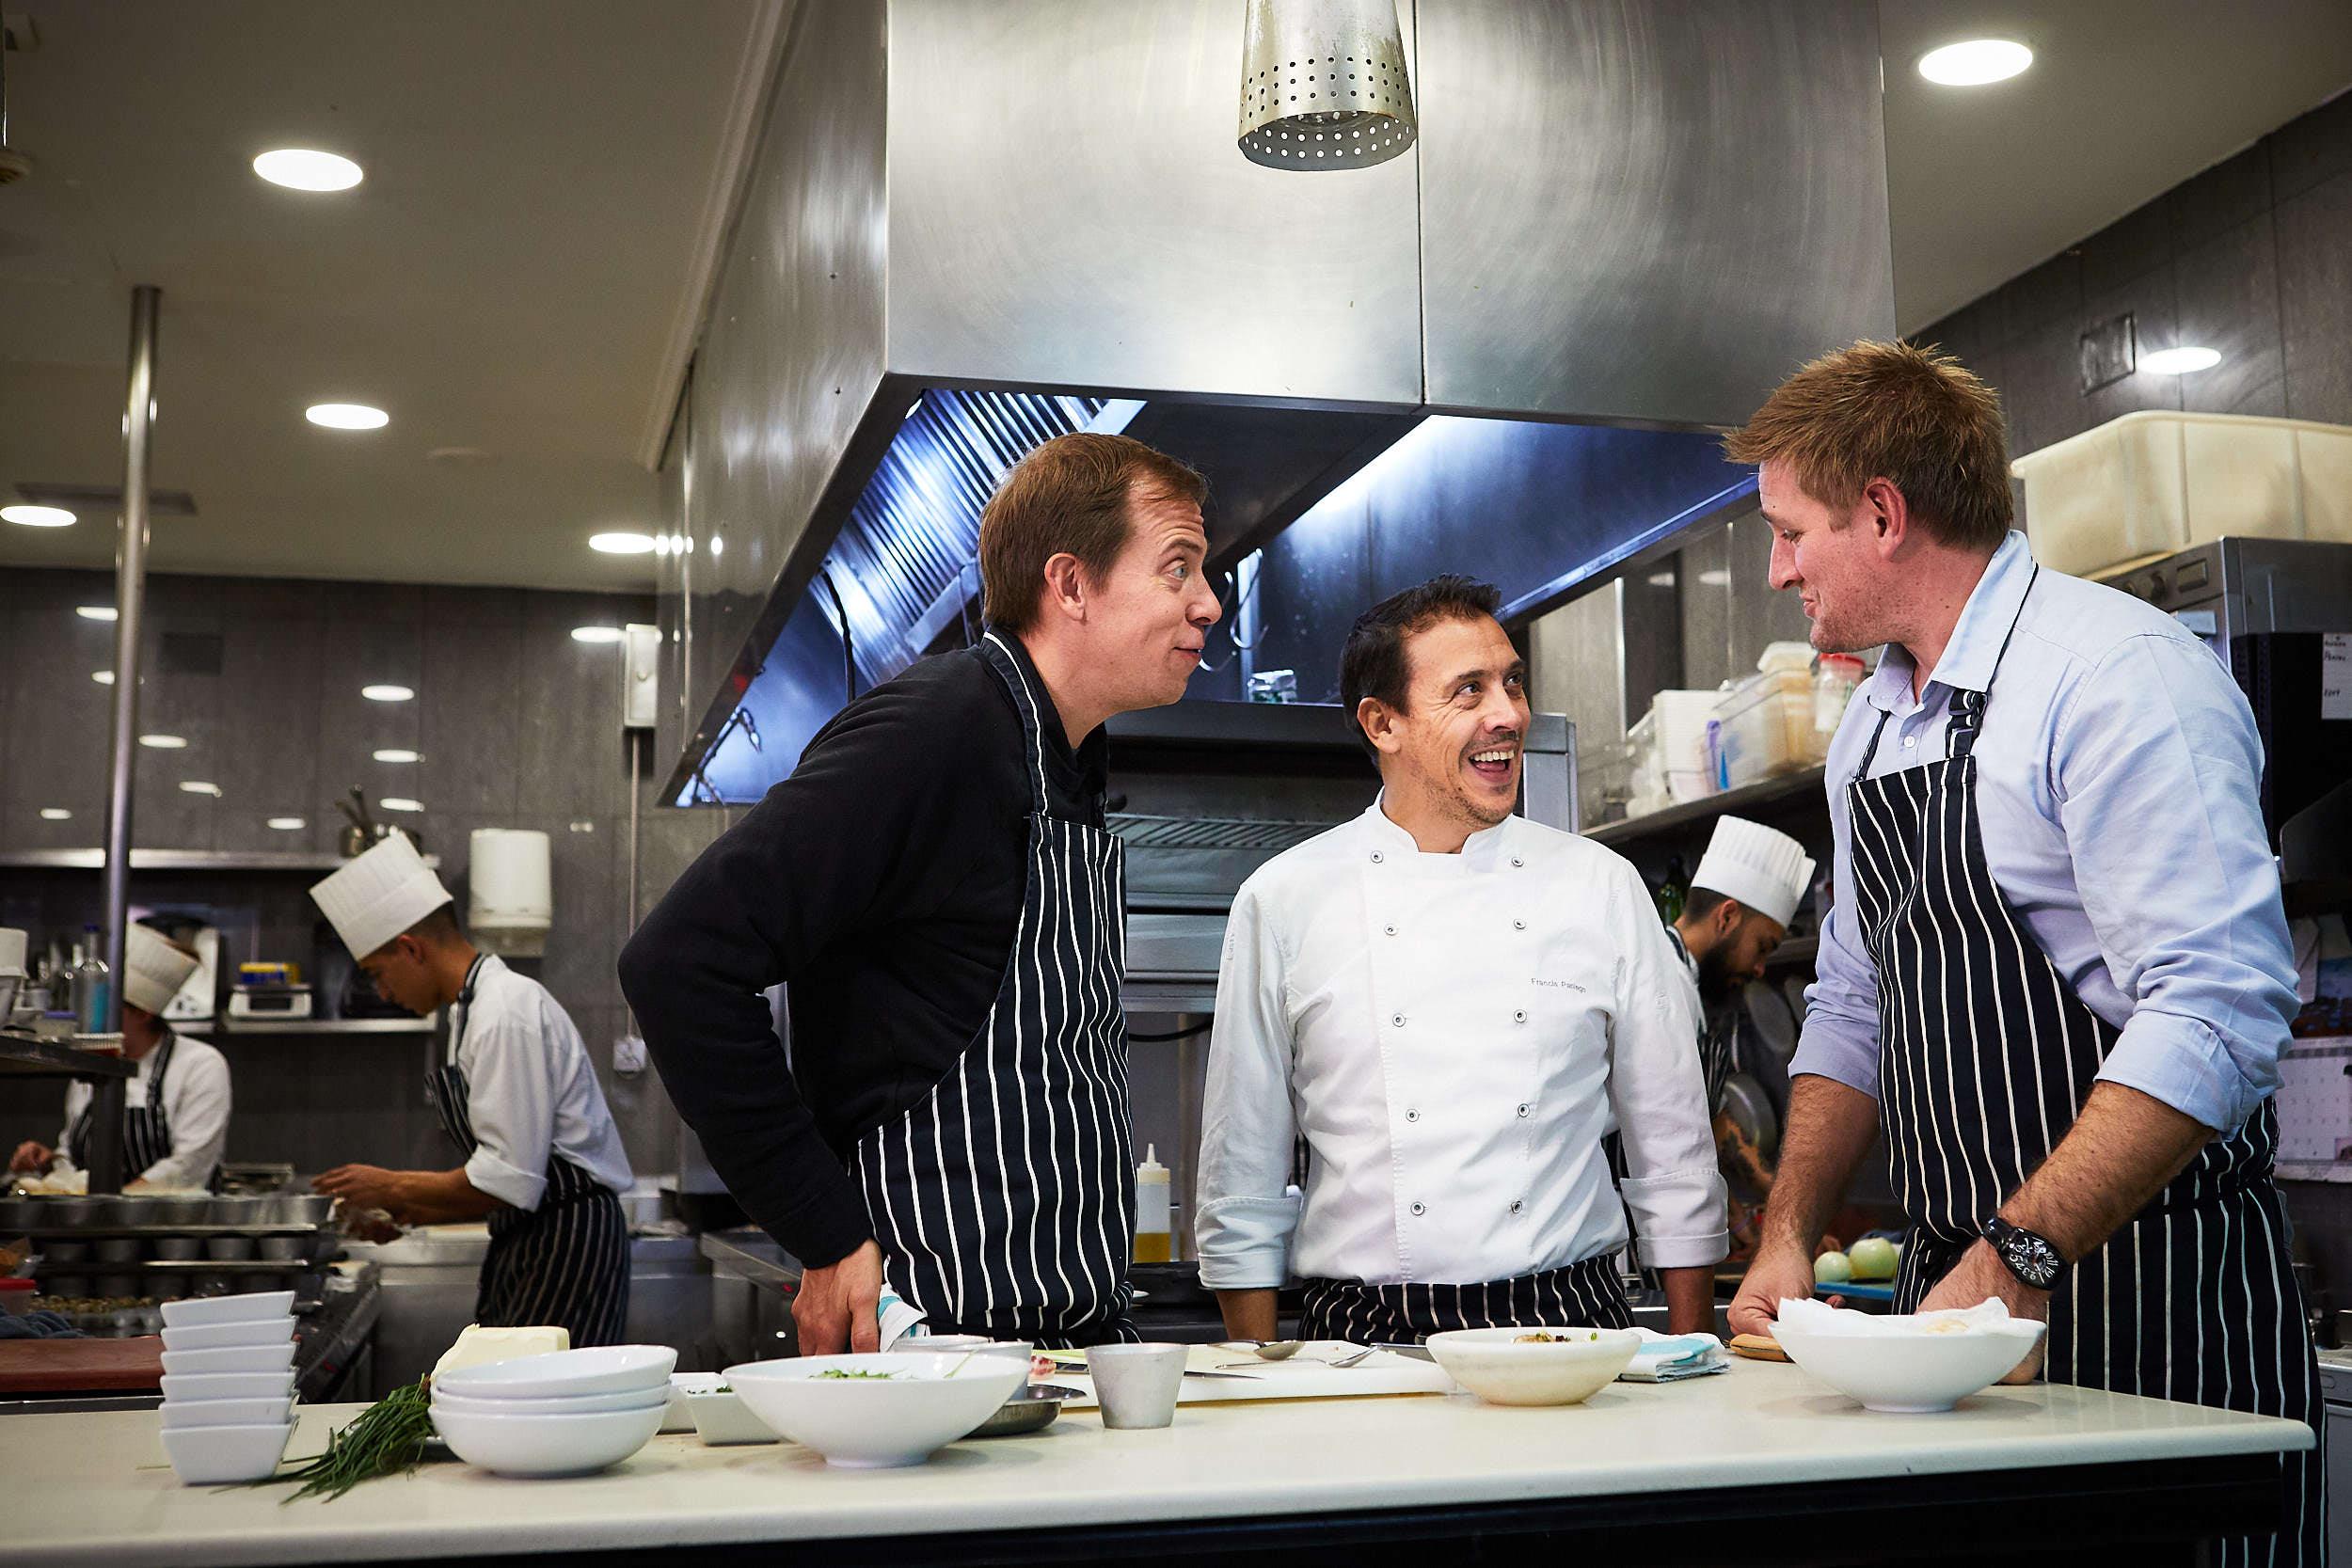 Fotografo_Profesional_La_Rioja_Pais_Vasco_Spain_Chef_Curtis_Stone_Sturcke_007.jpg